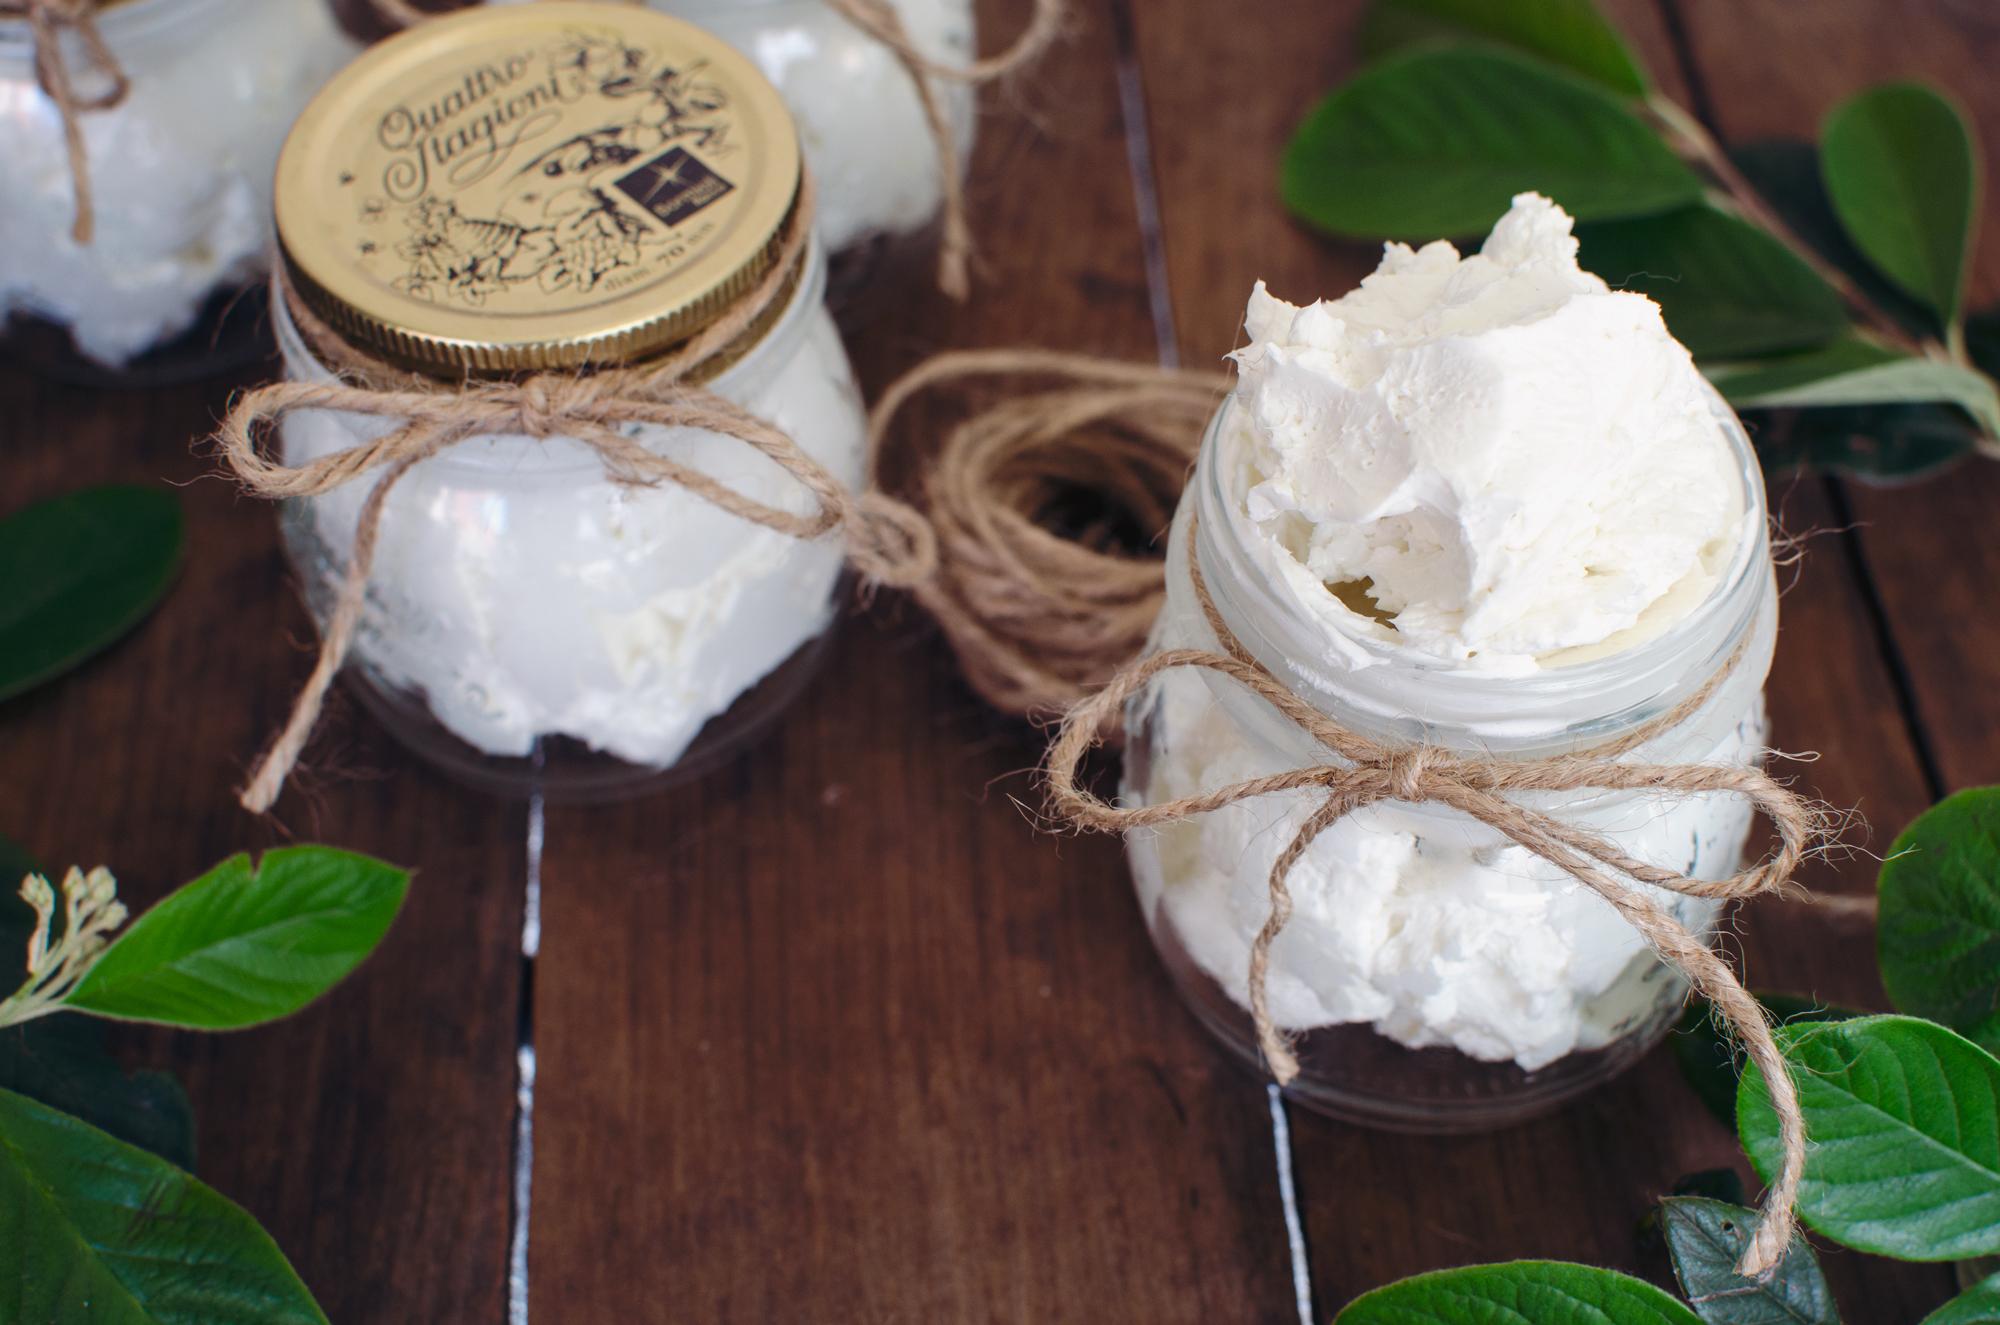 Homemade Whipped Body Butter - best homemade beauty recipe